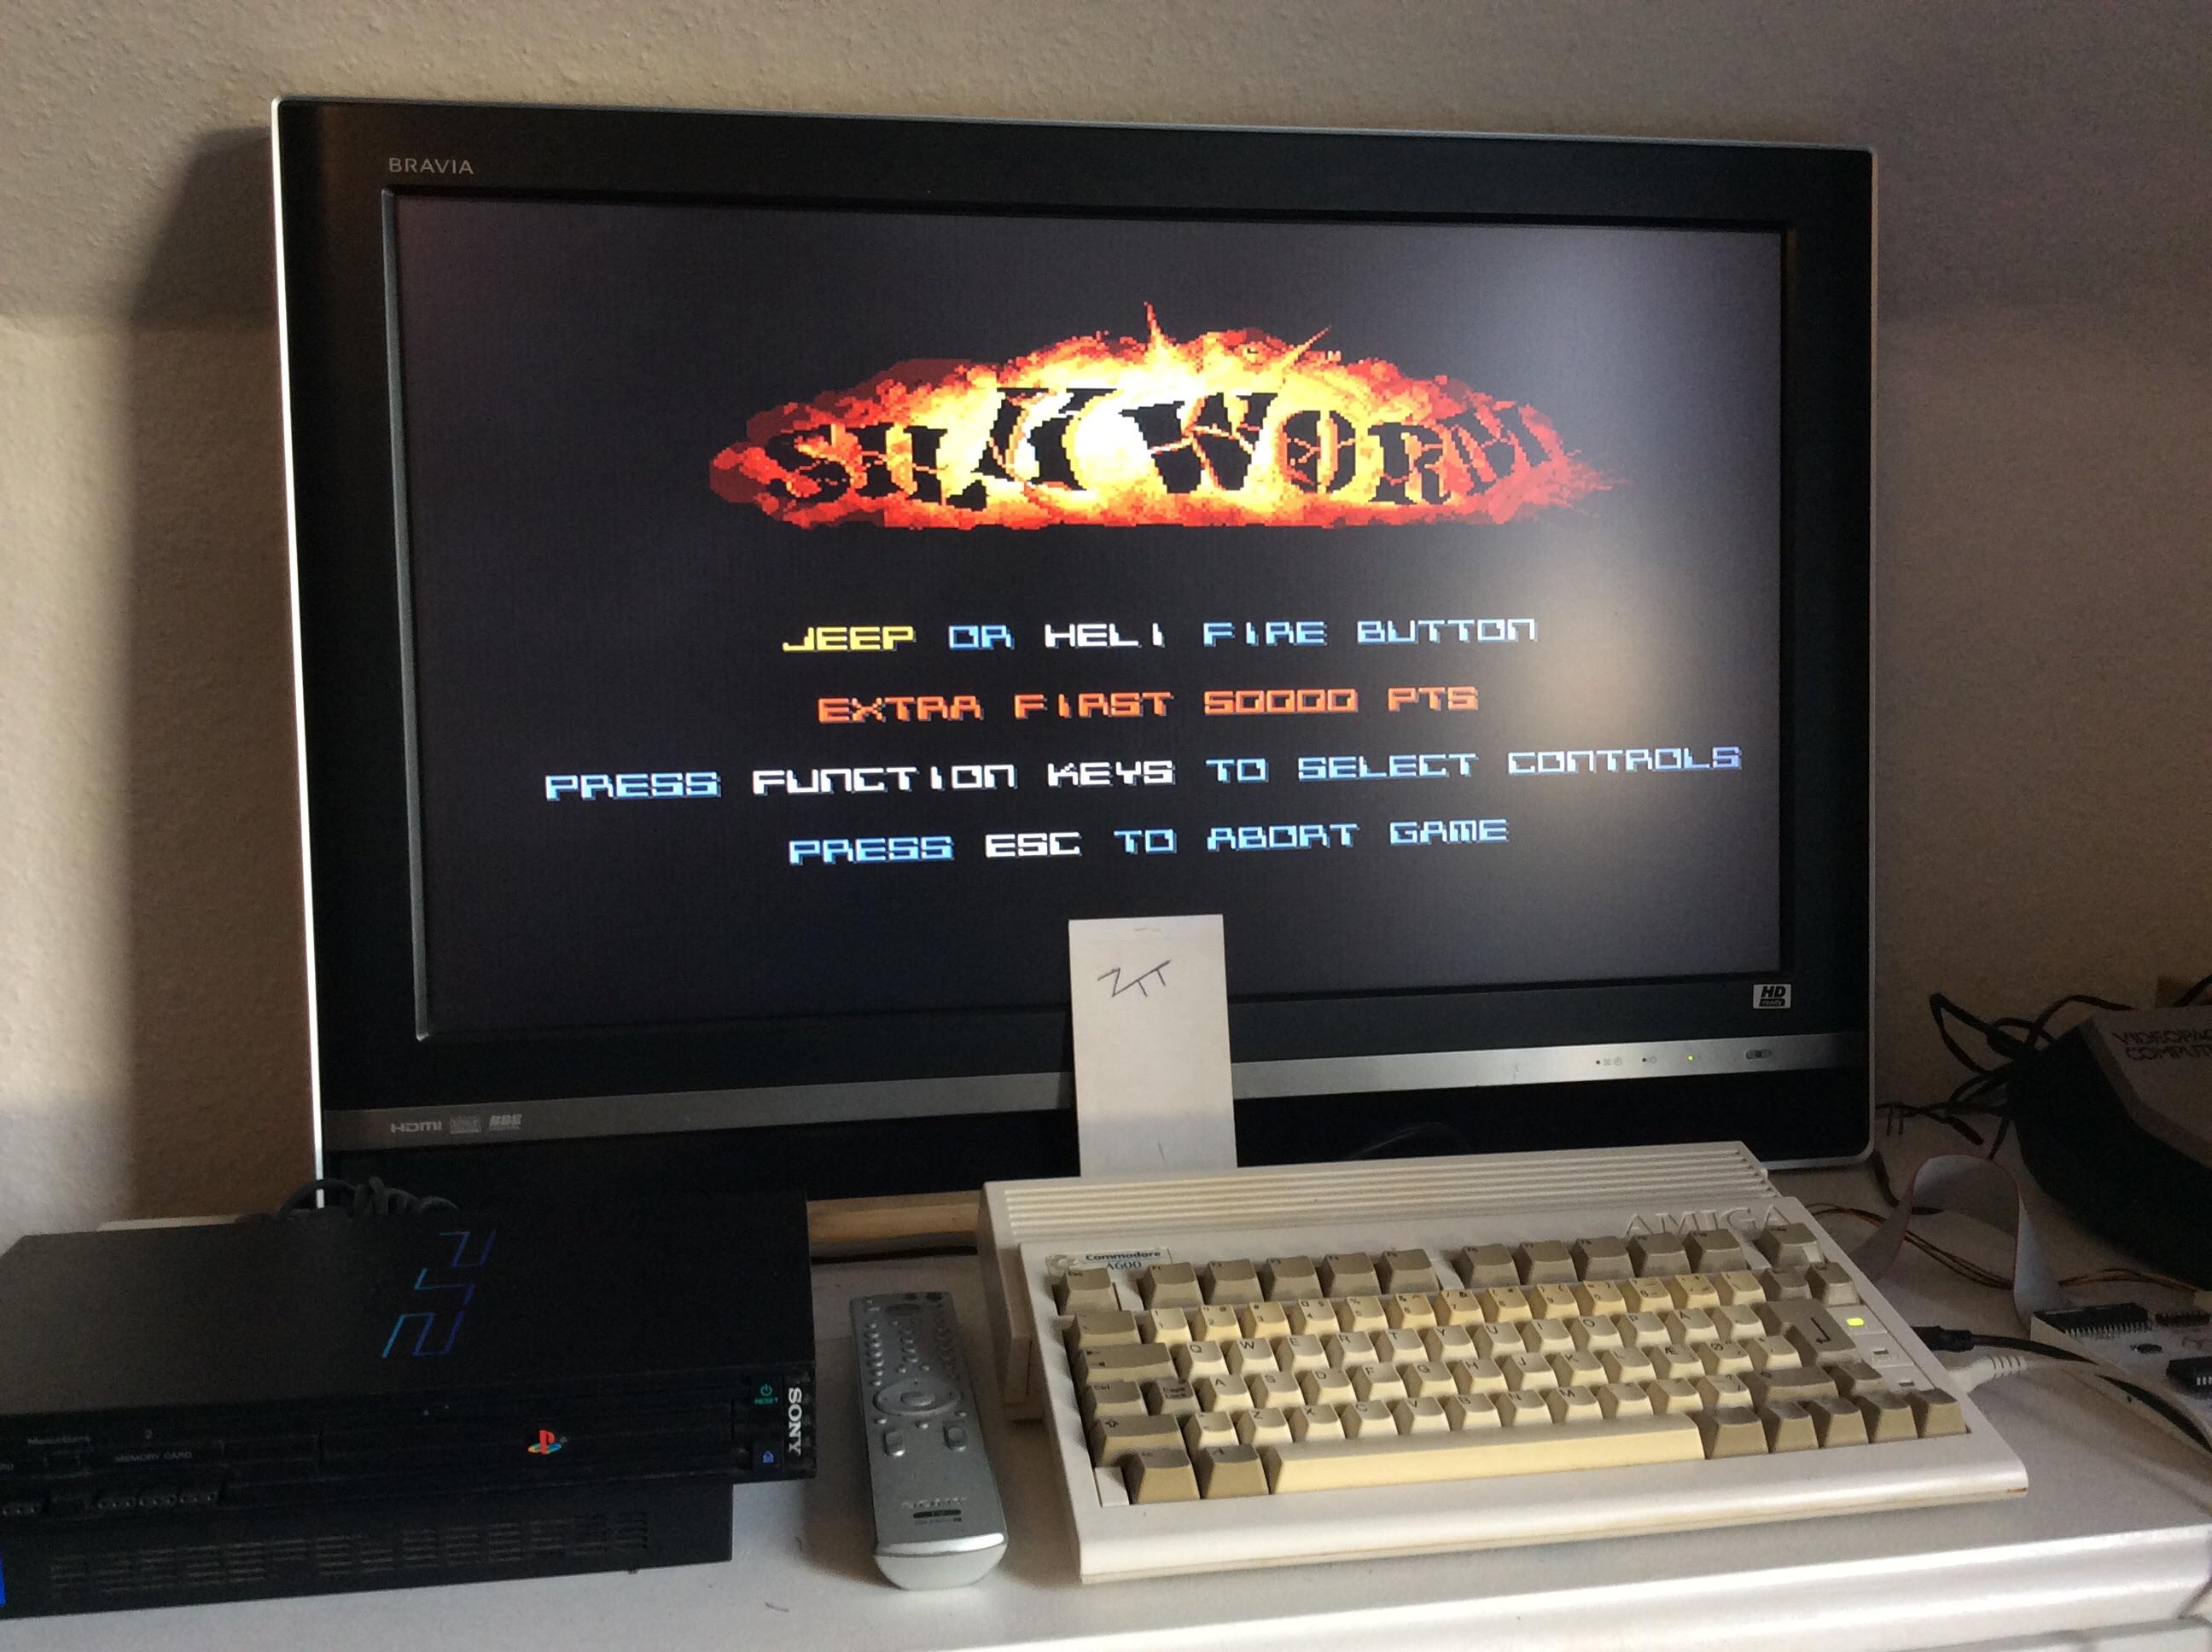 Frankie: Silkworm (Amiga) 168,300 points on 2016-10-29 02:39:34